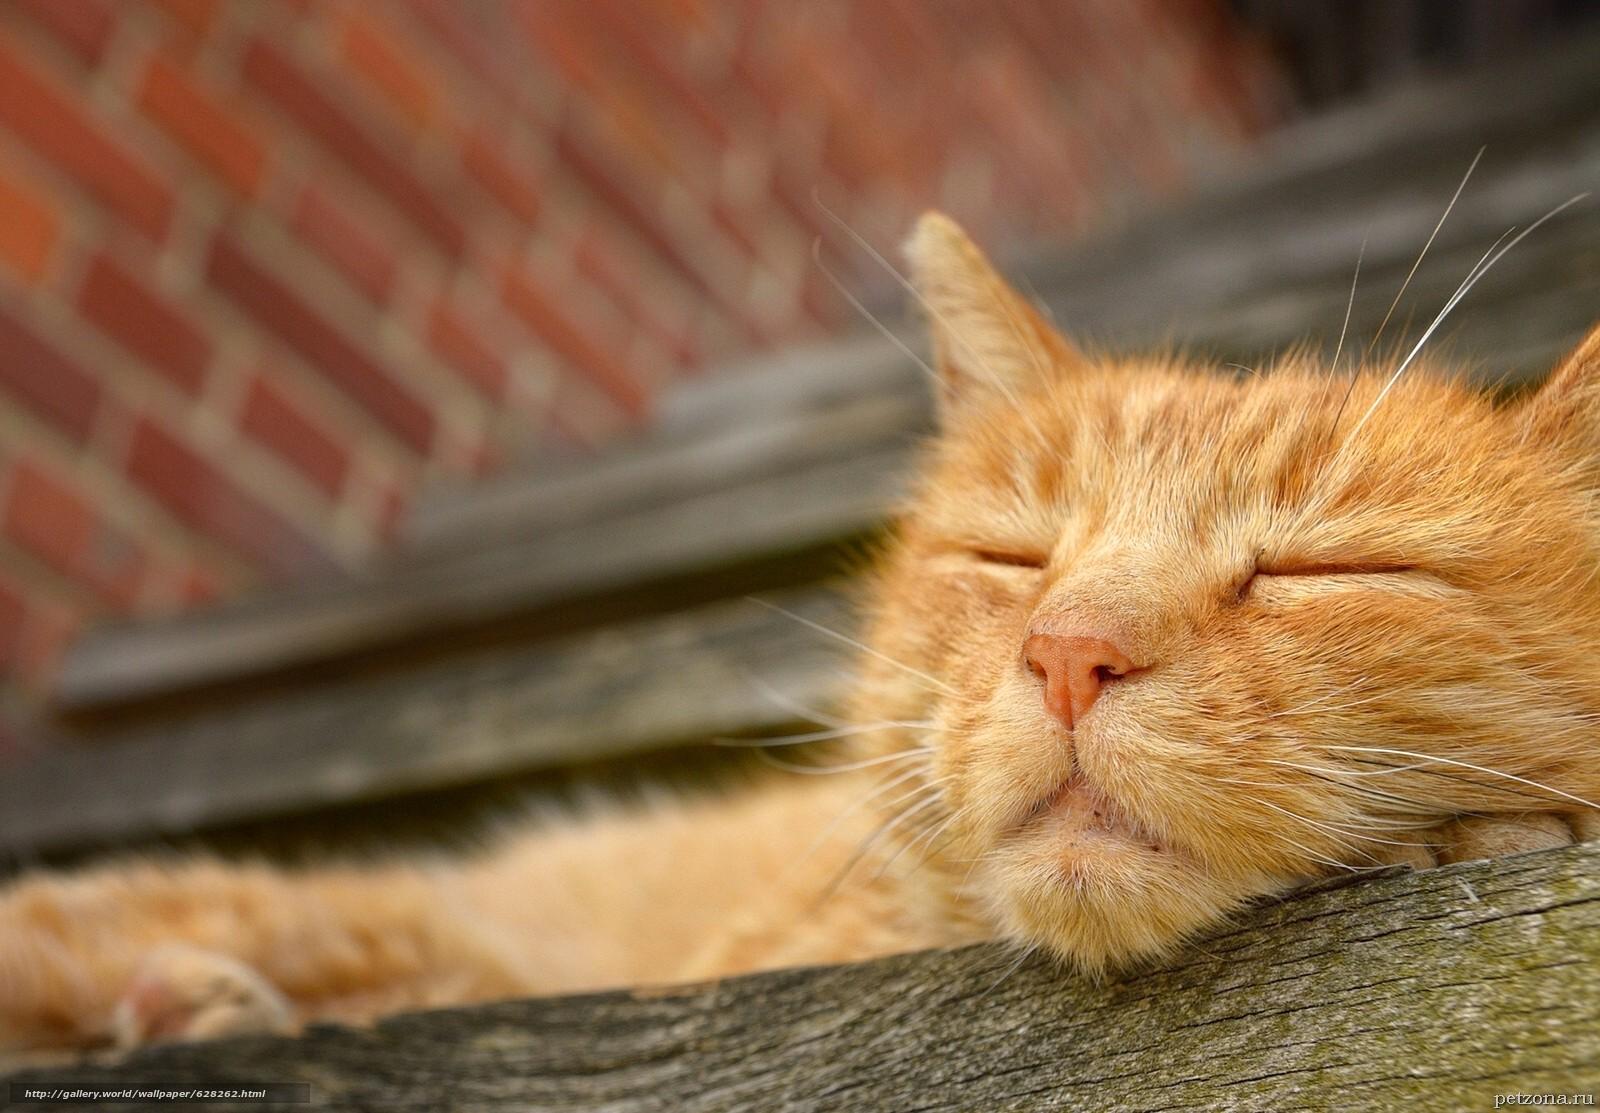 Дневник кота Плинтуса. Часть 1 (1.1)